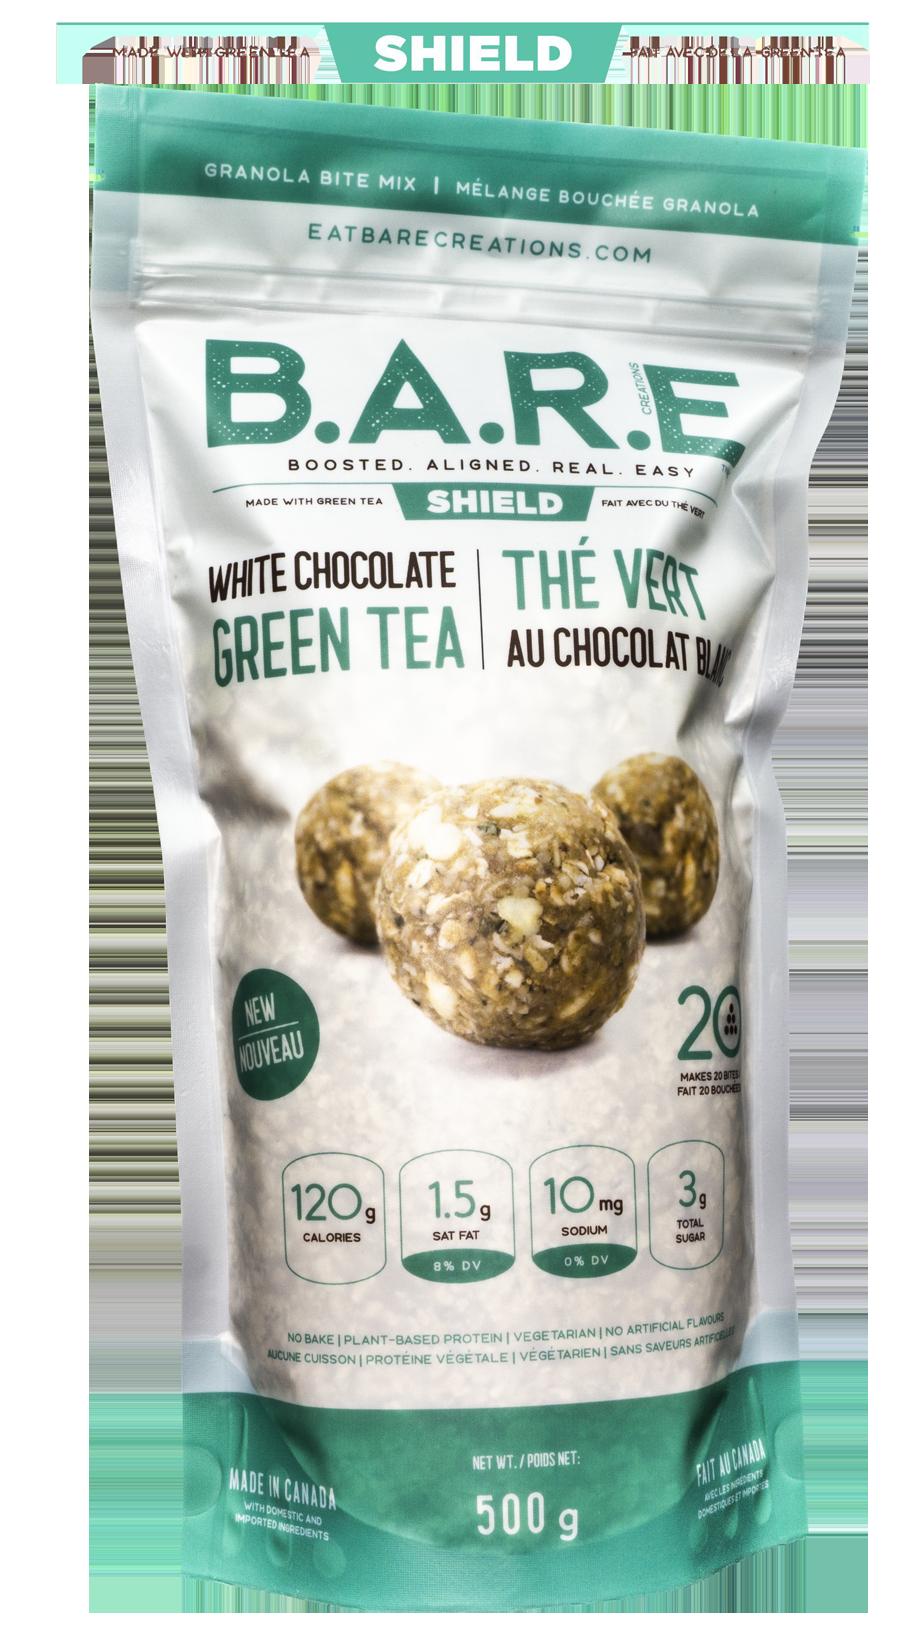 White Chocolate Green Tea Granola Bite Bar Mix